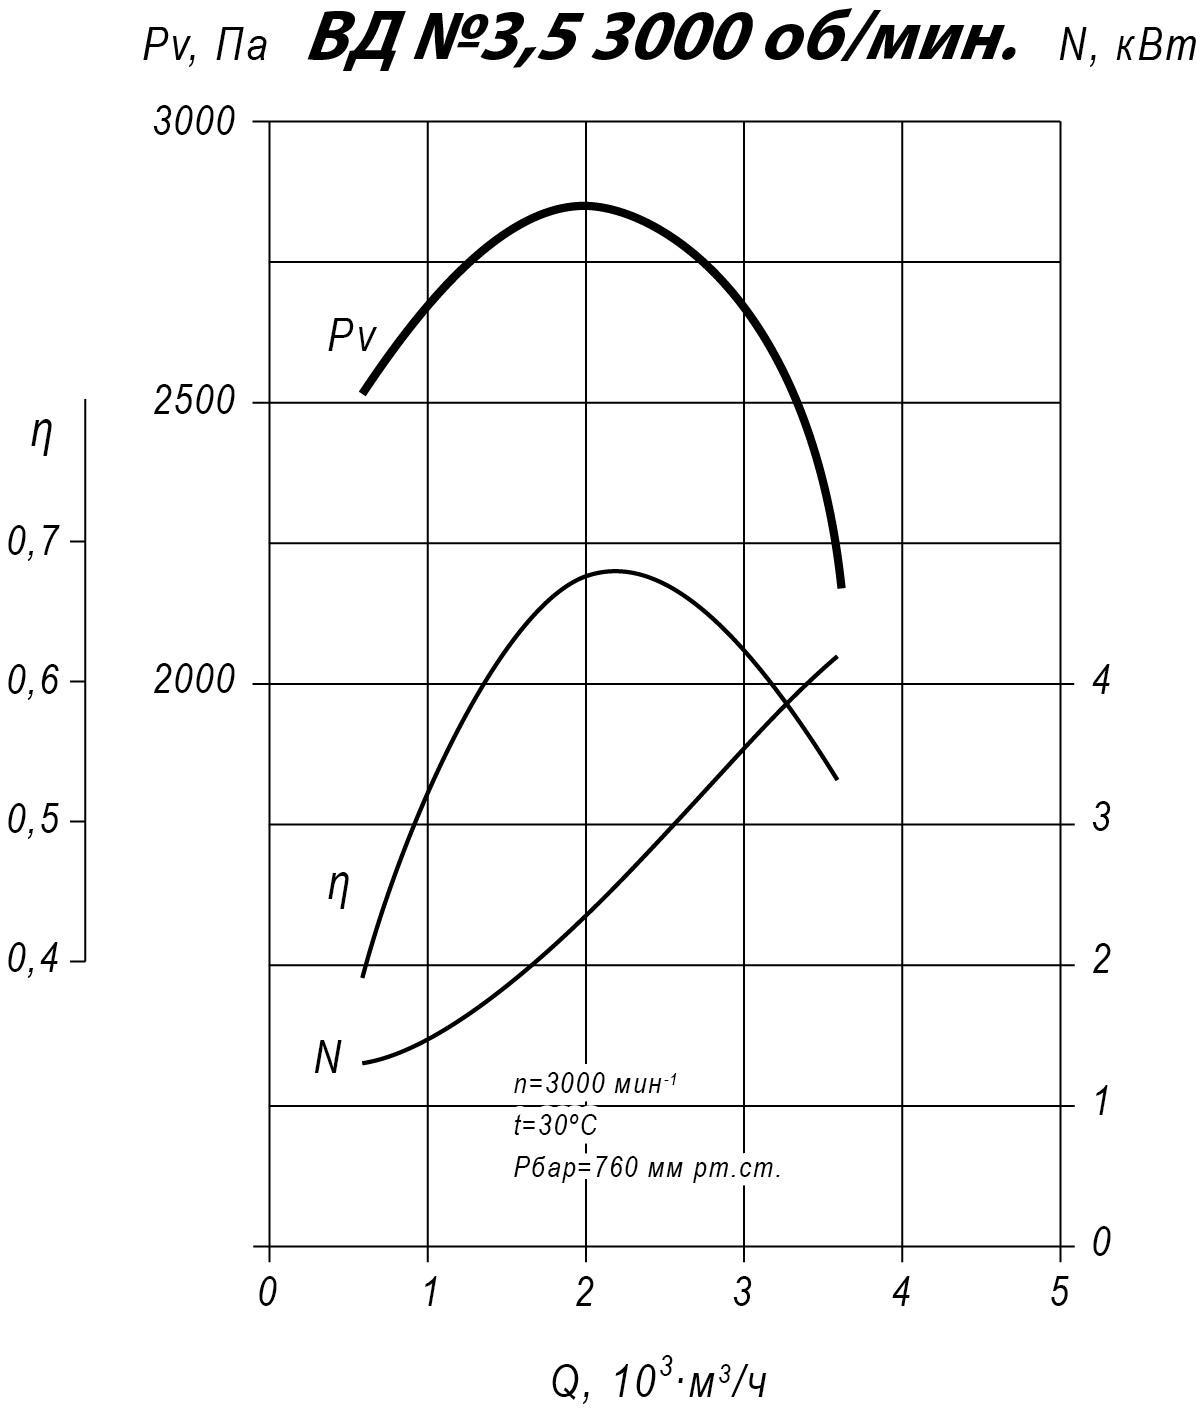 Аэродинмаические характеристики вентилятора ВД-3,5